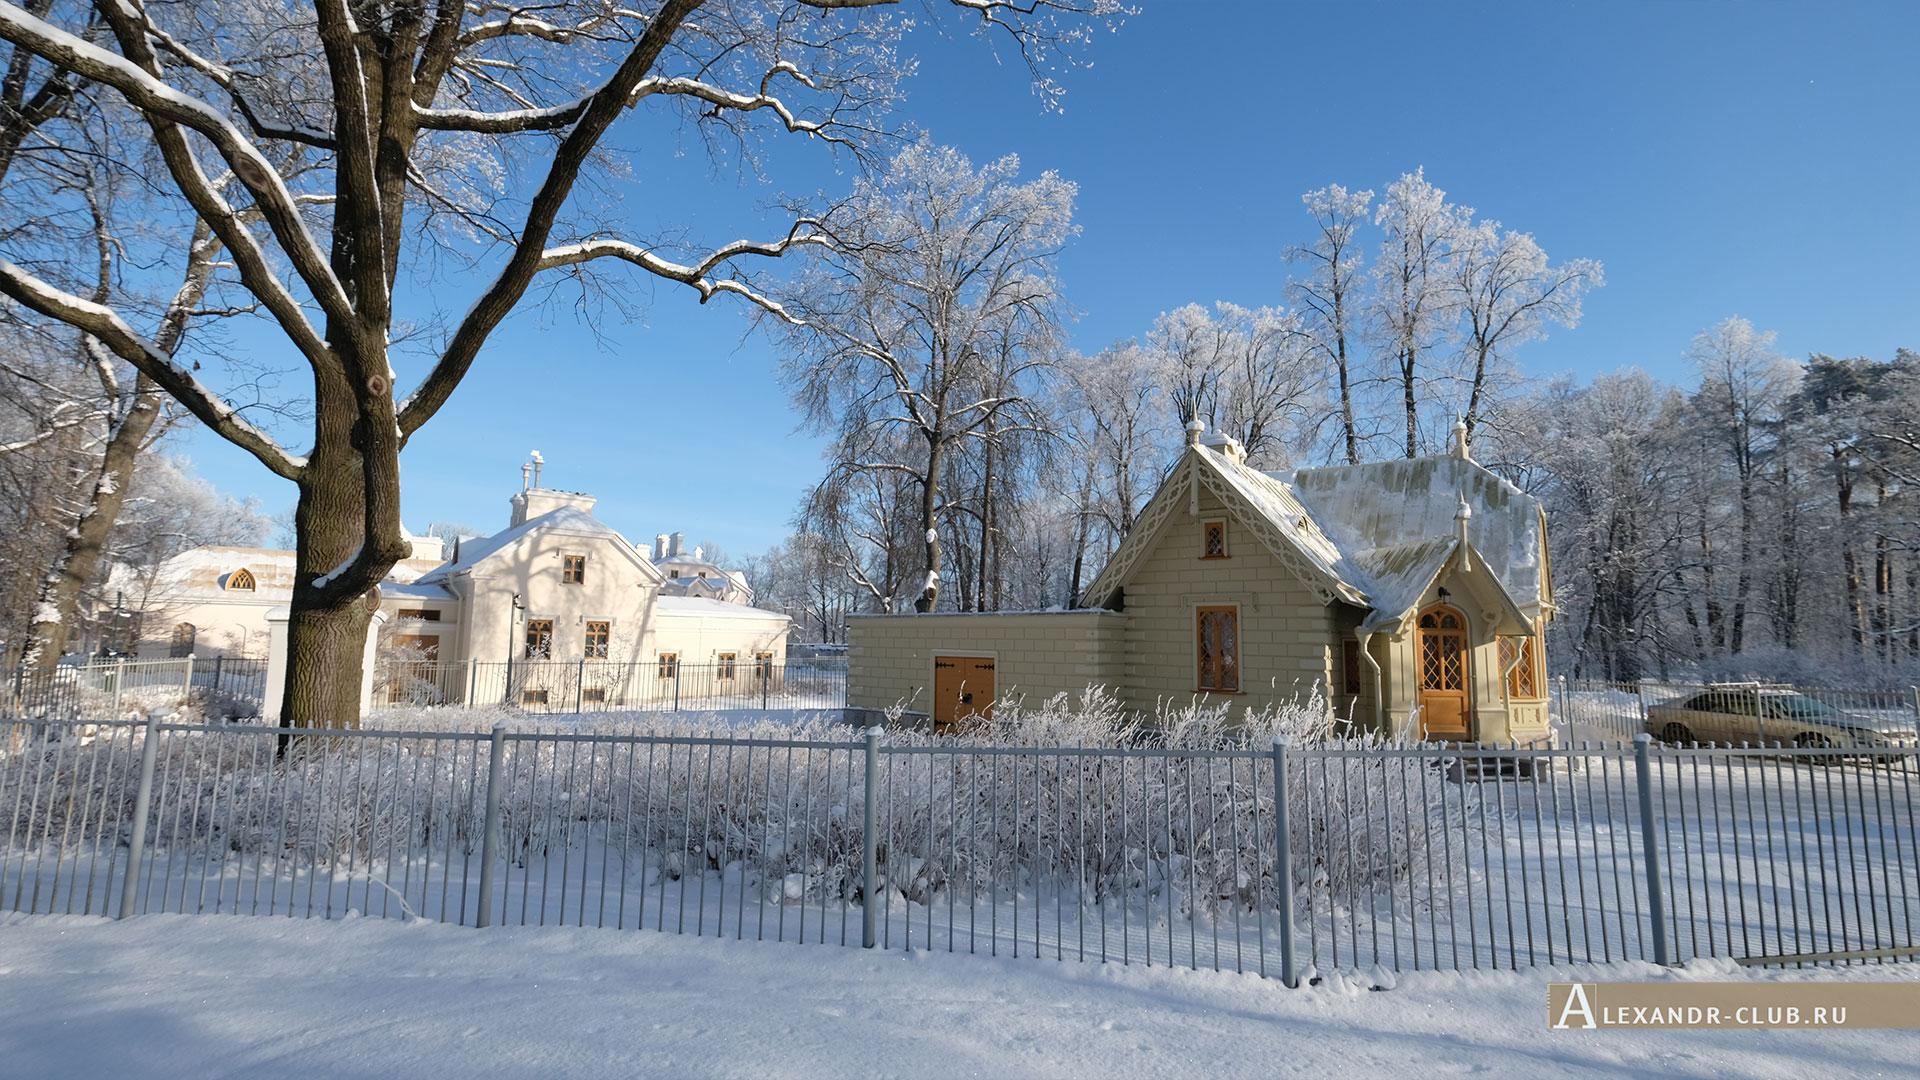 Петергоф, зима, парк «Александрия», Фельдъегерский домик, Фермерский дворец